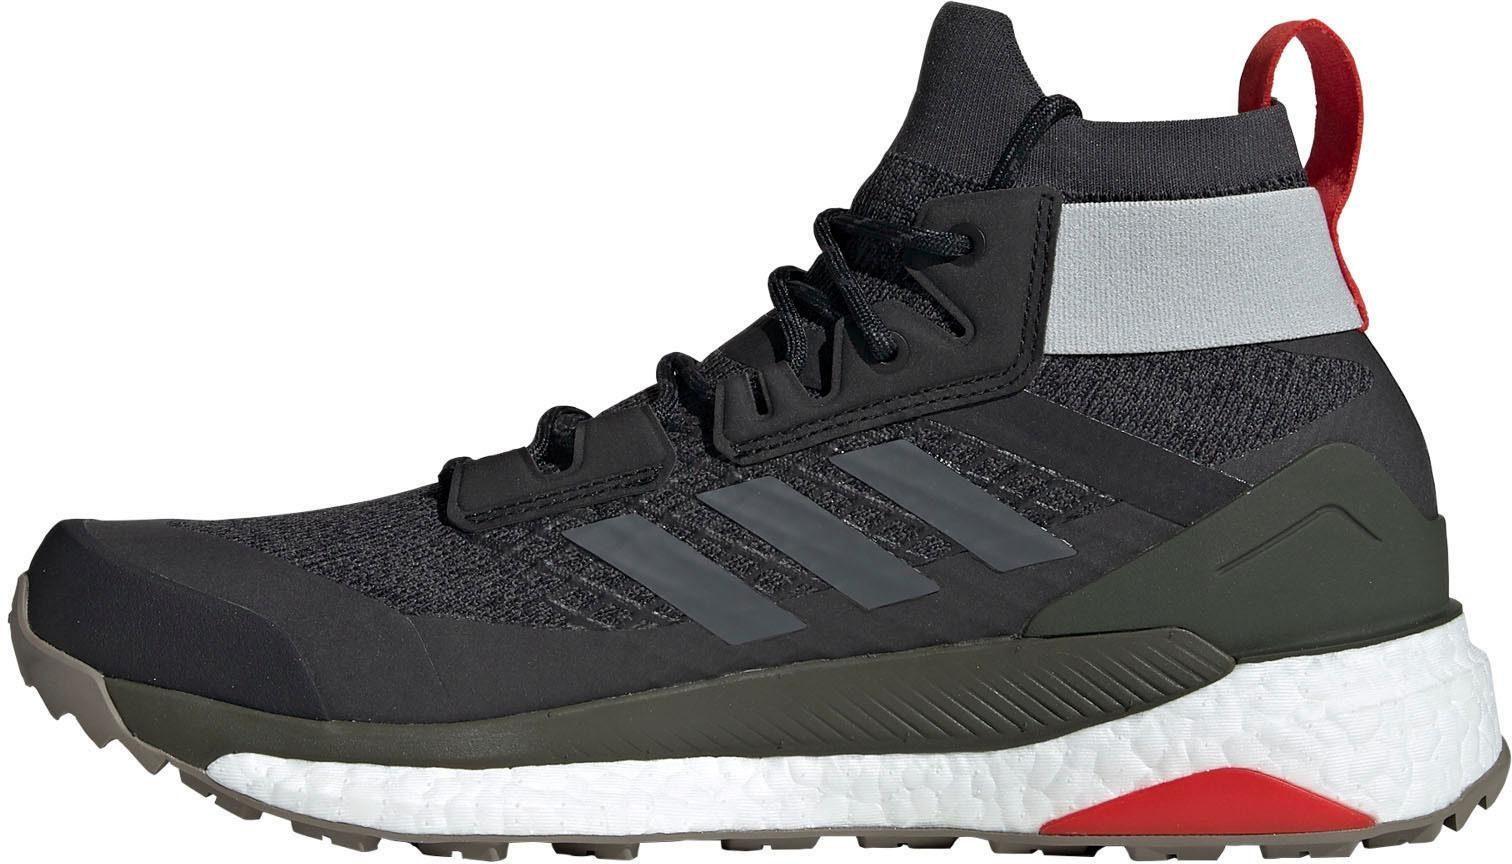 Adidas Terrex Free Hiker ab 99,98 € (aktuelle Preise